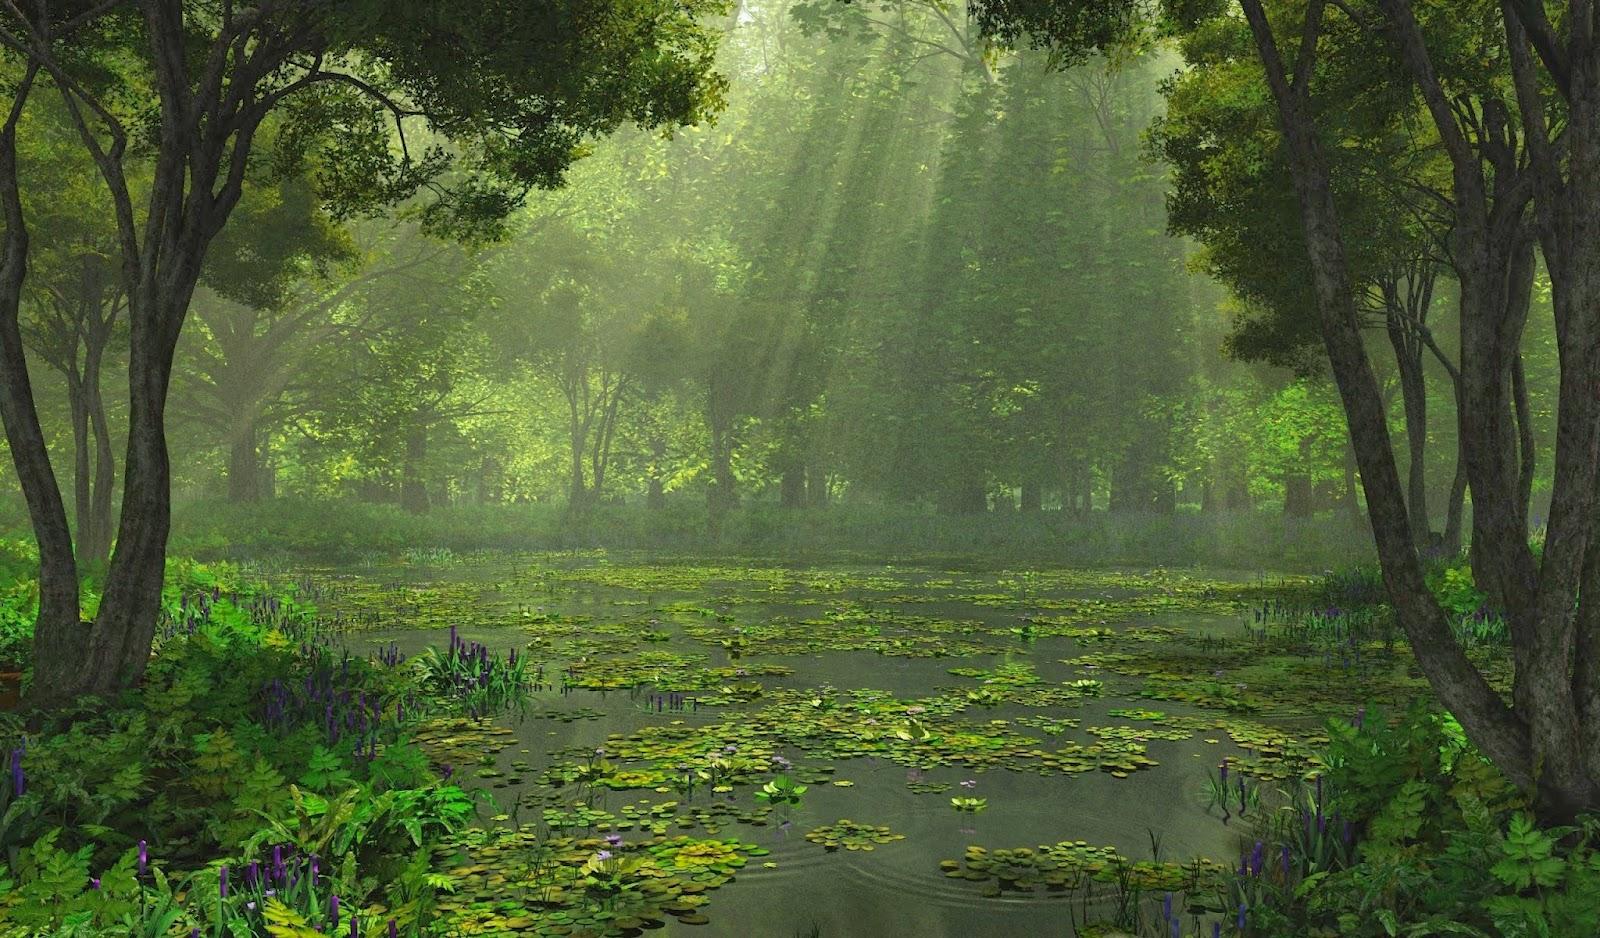 Rain Beautiful Nature Wallpaper | Picture Gallery